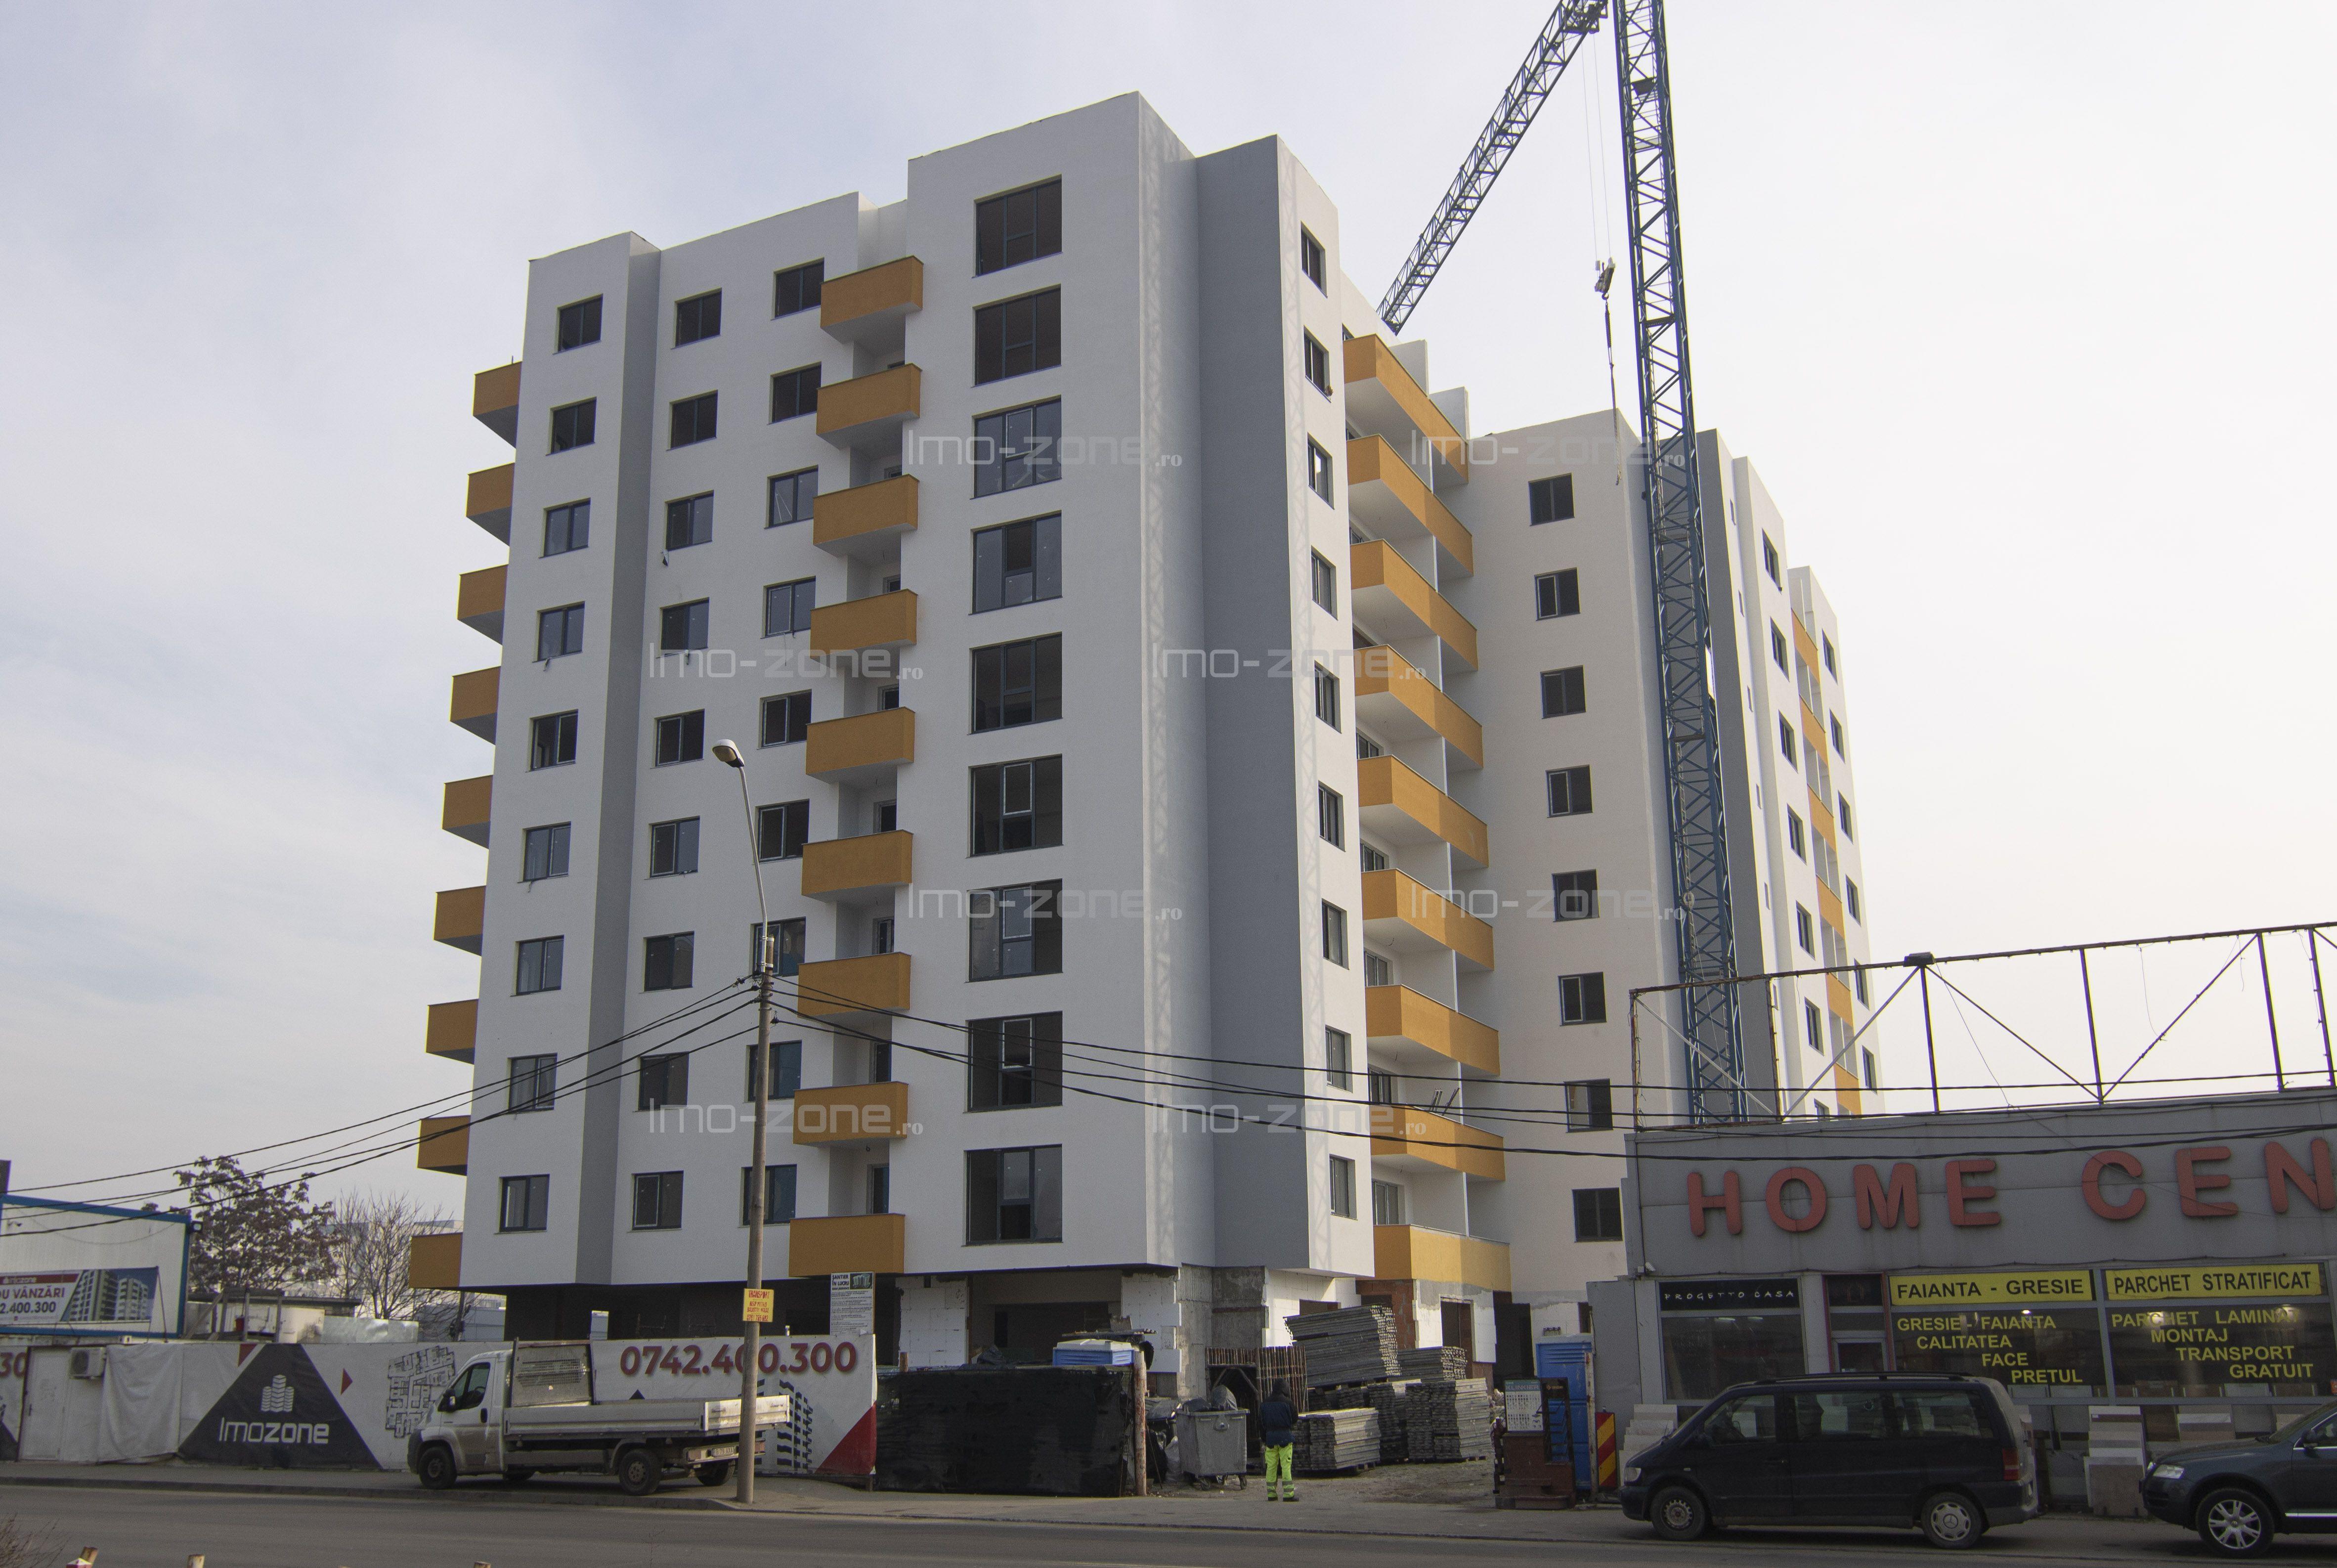 68 mp, localizat langa metrou, MILITARI - PACII, etajul 8, COMISION 0%